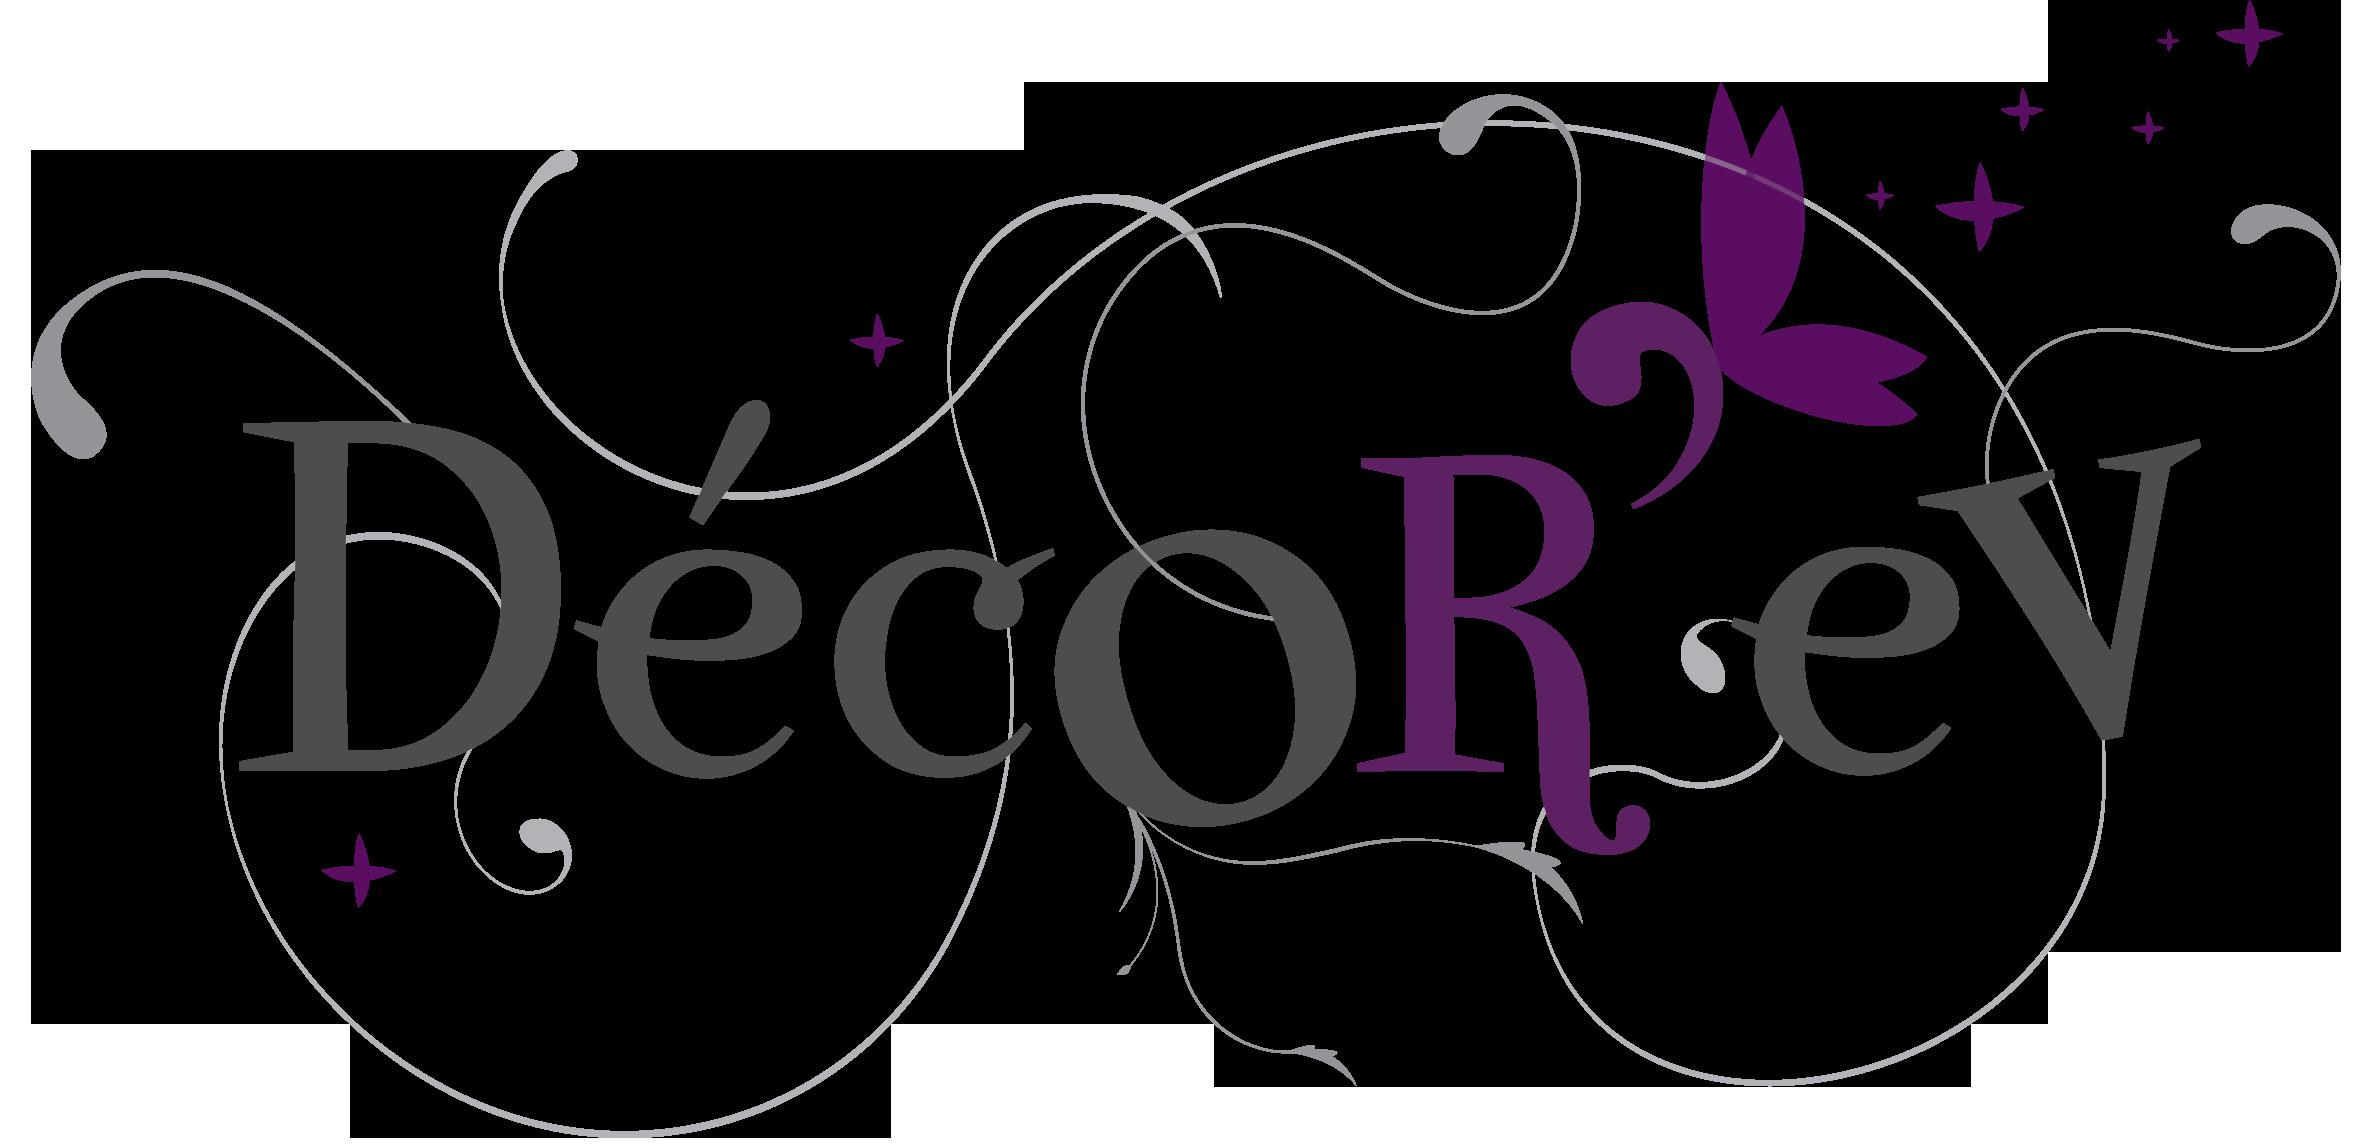 Decor'ev